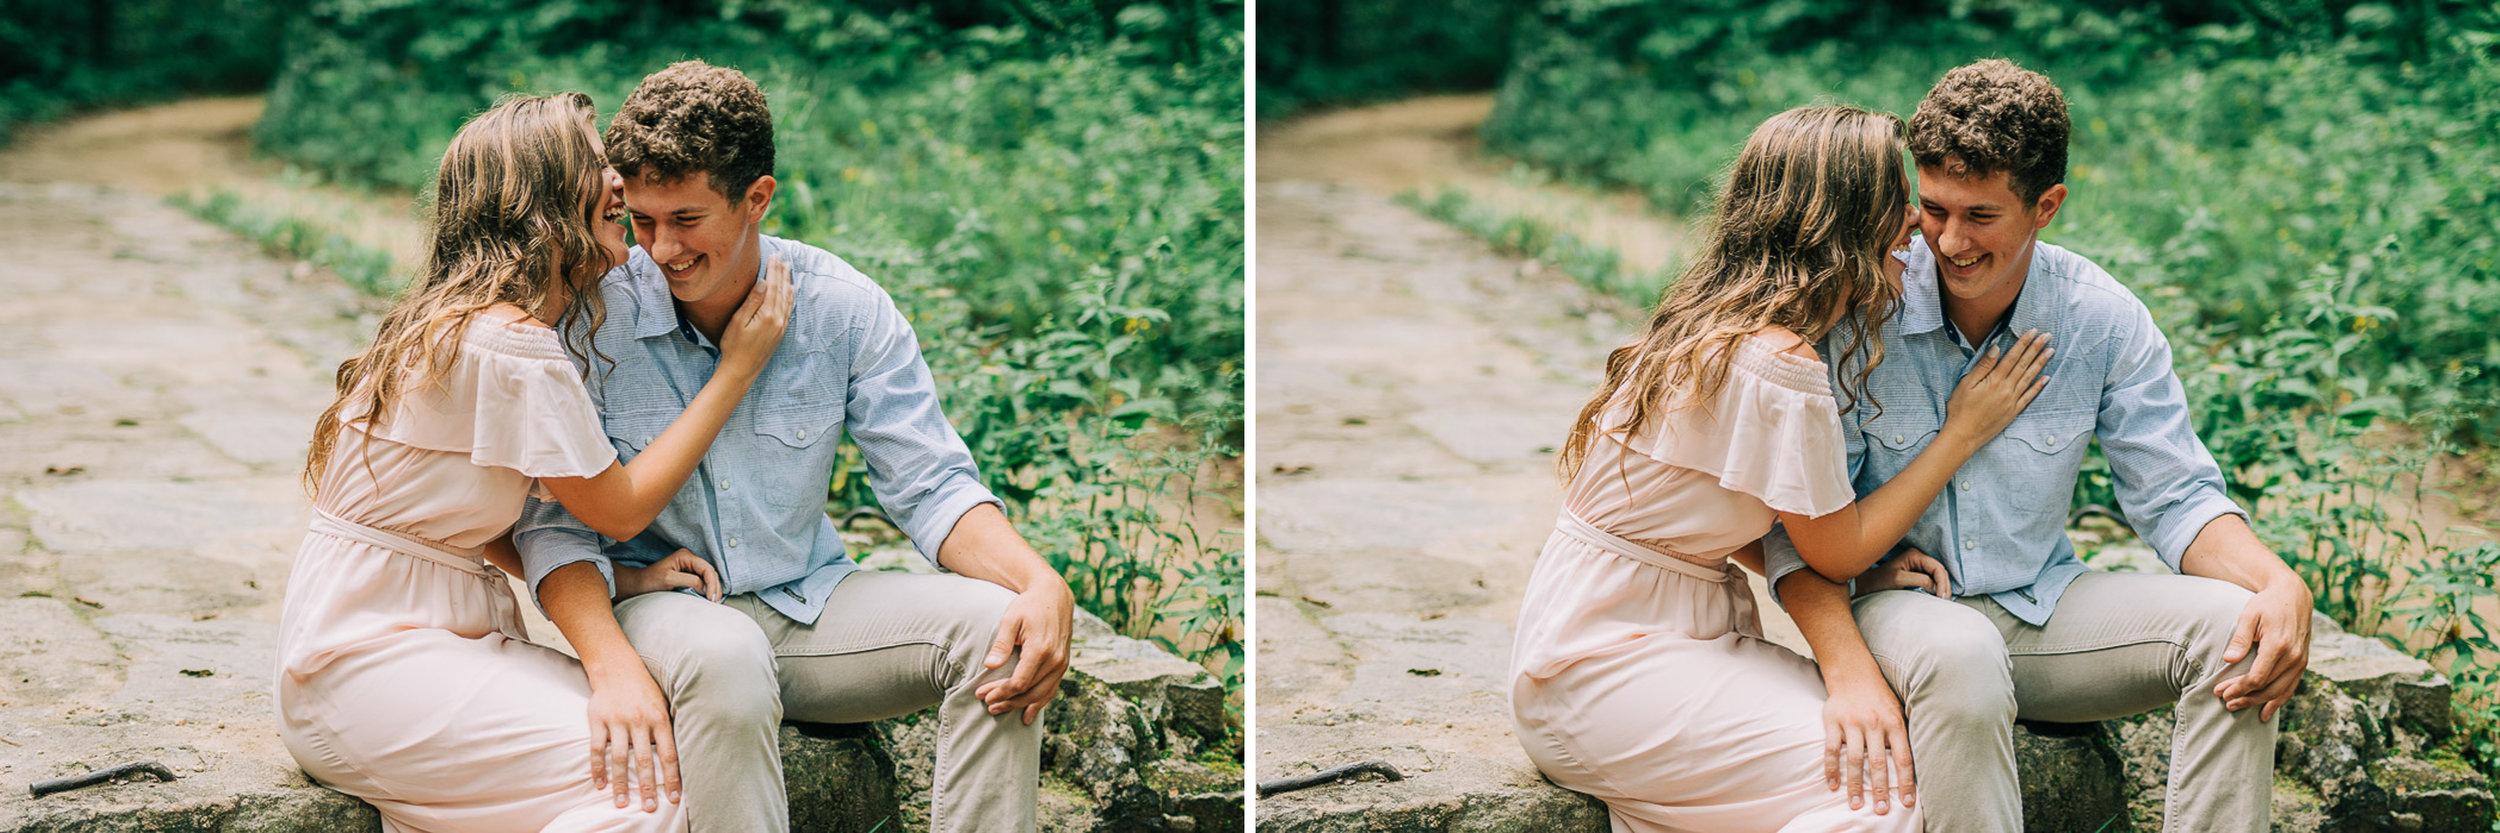 Engagement Portraits, Summer Engagement, Summer Mast Photography, 29.jpg